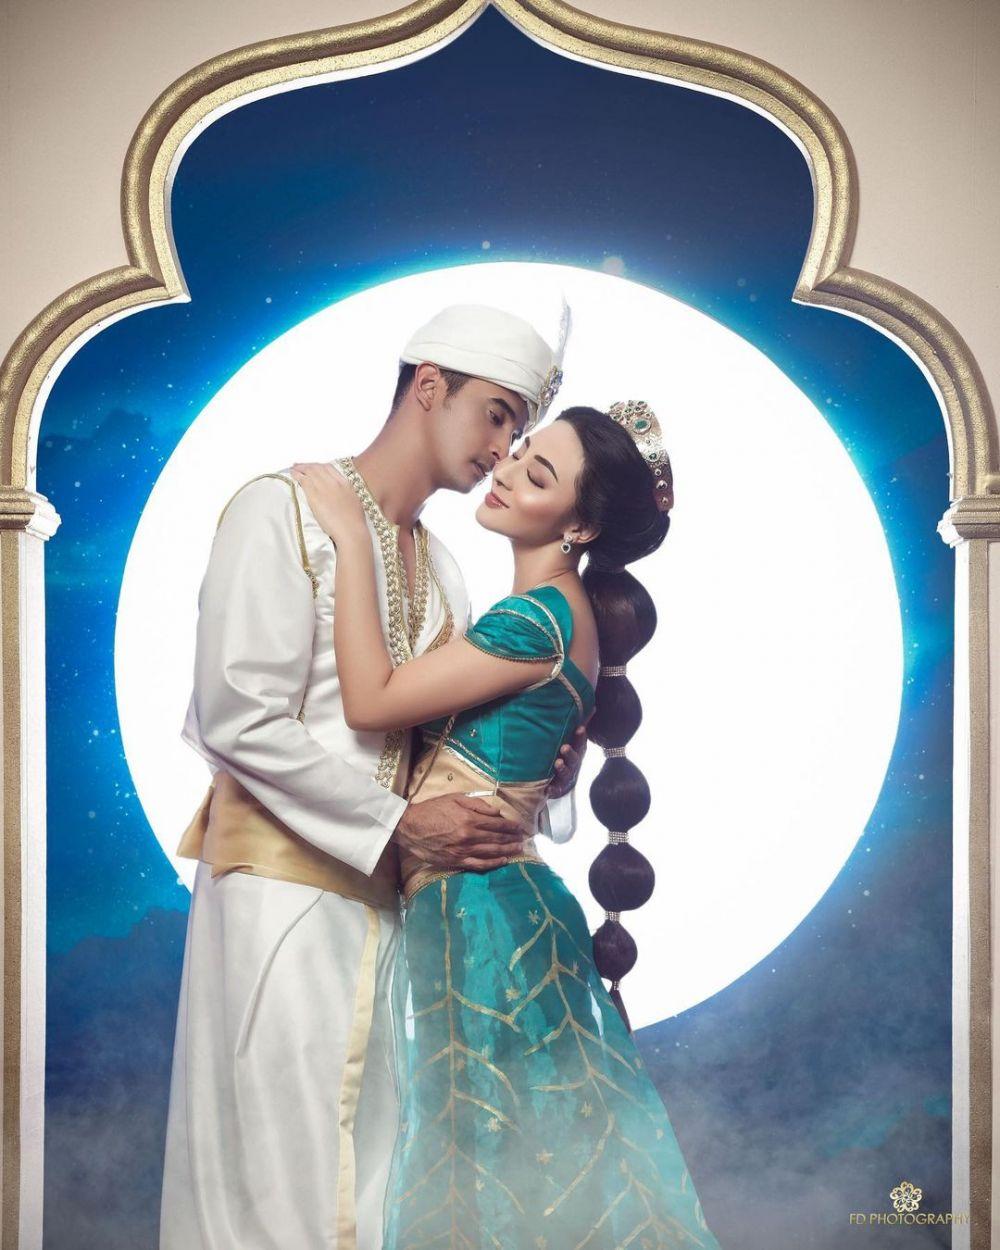 Ali Syakieb dan Margin Wieheerm pemotretan ala Aladdin © Instagram